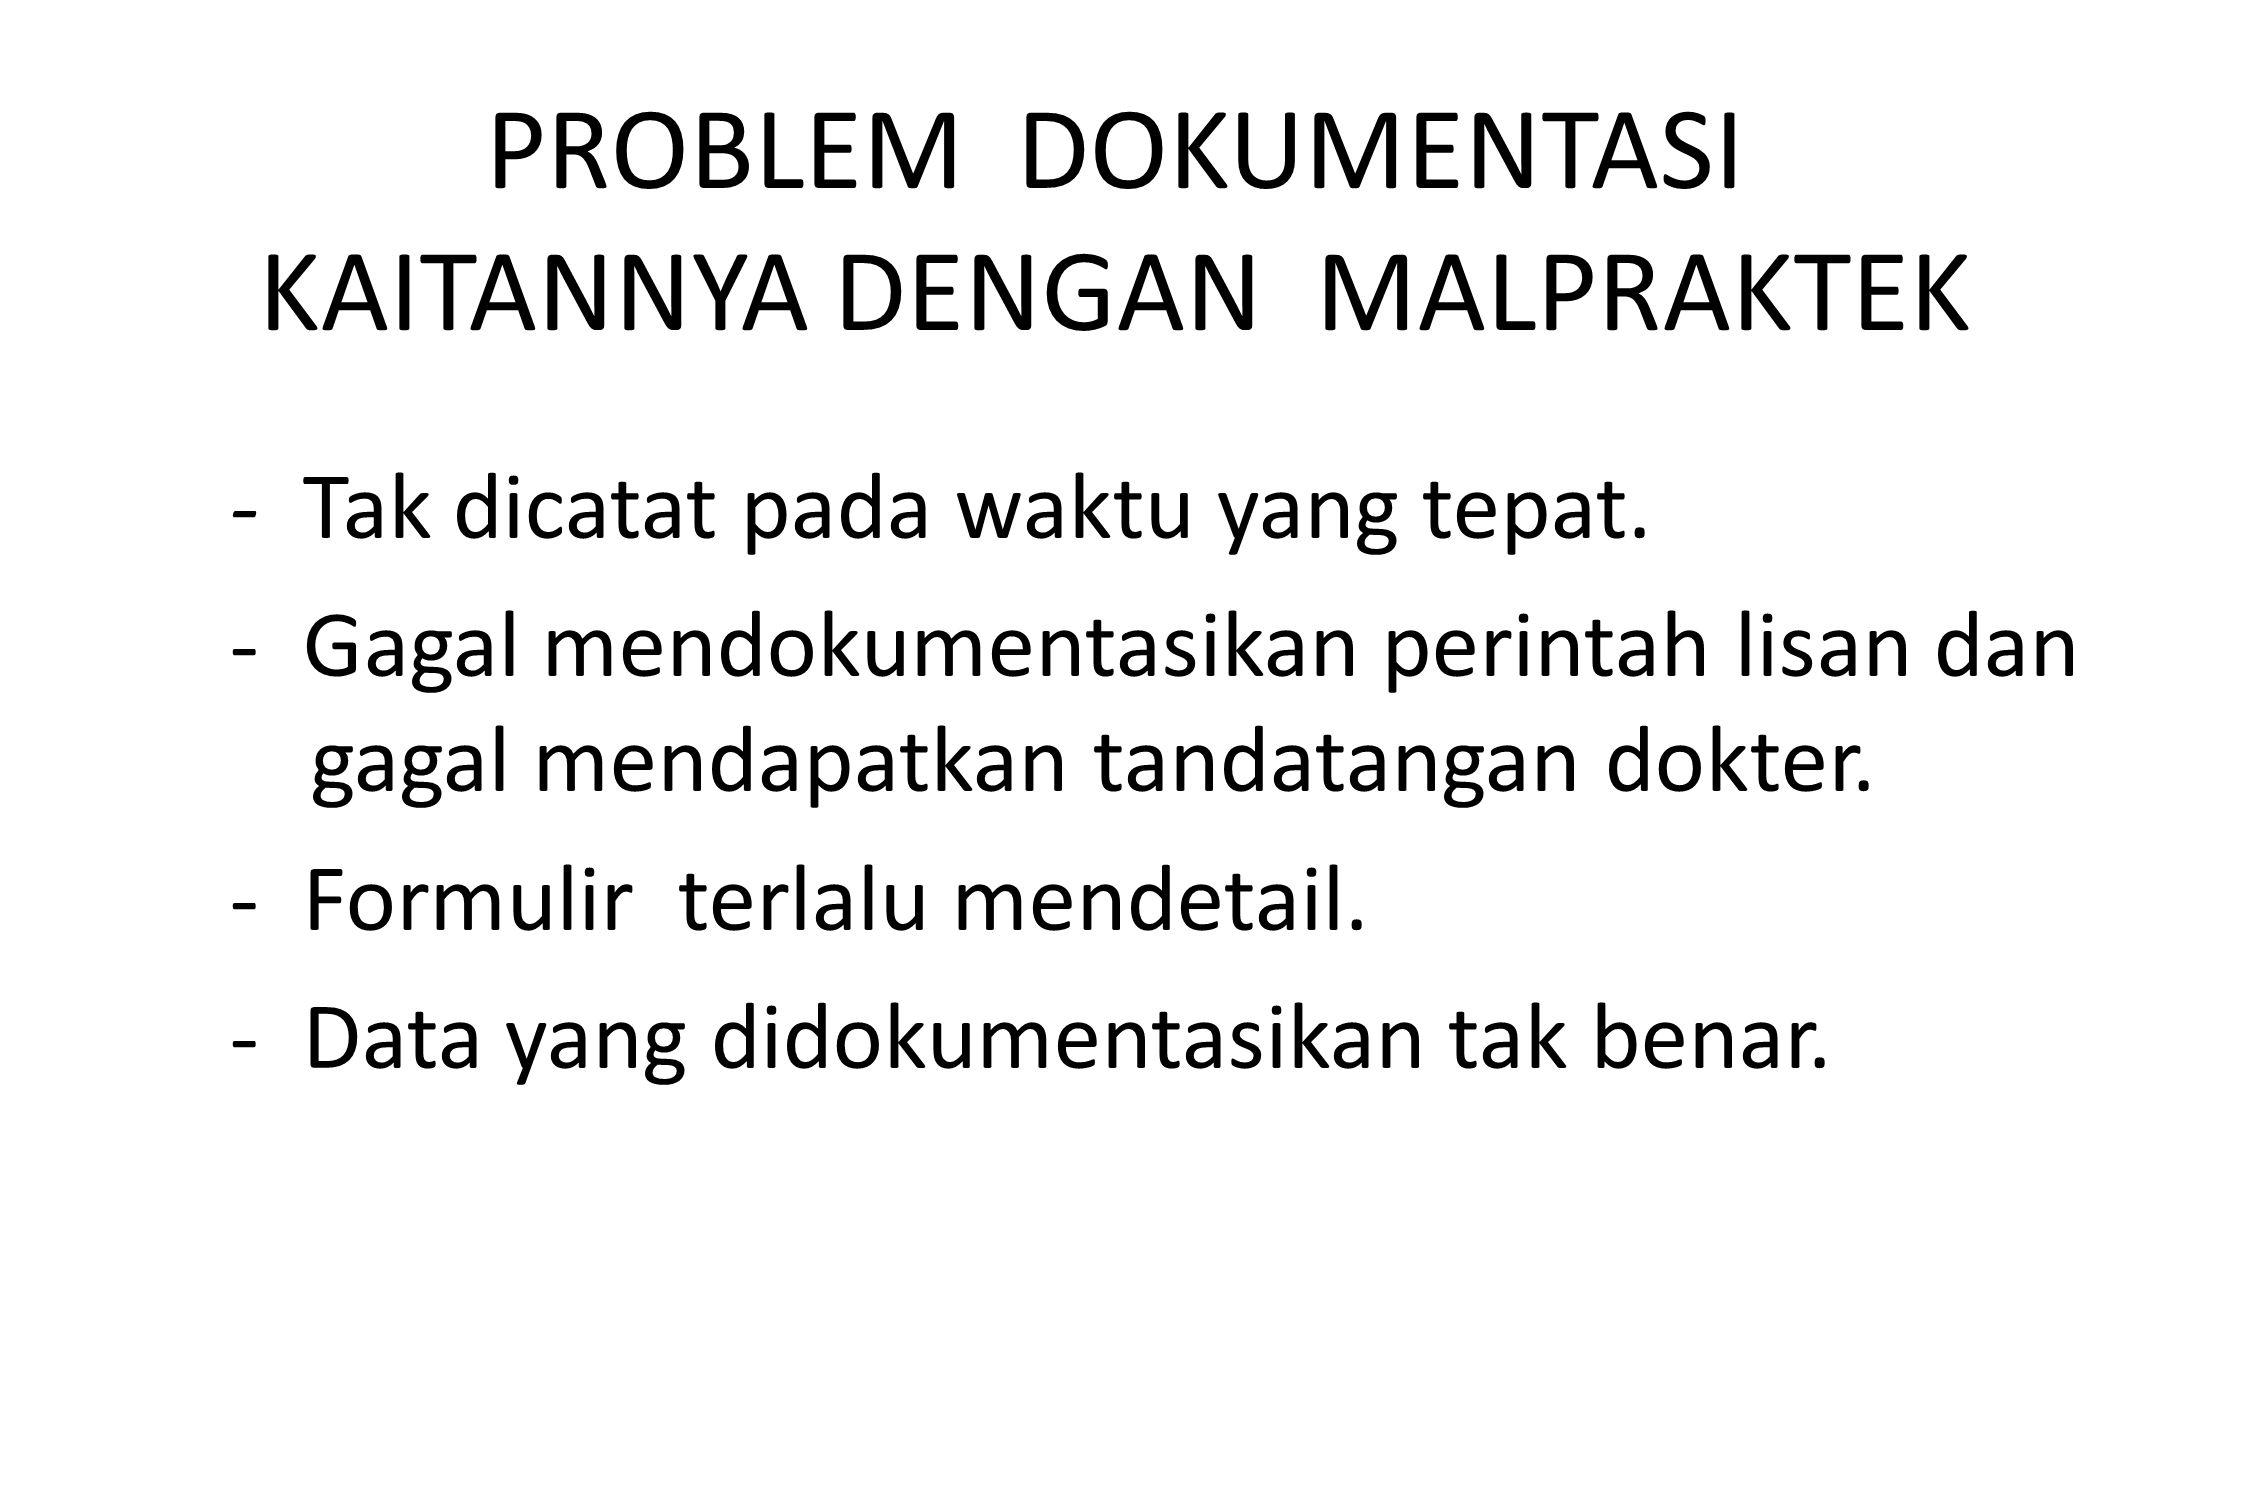 PROBLEM DOKUMENTASI KAITANNYA DENGAN MALPRAKTEK